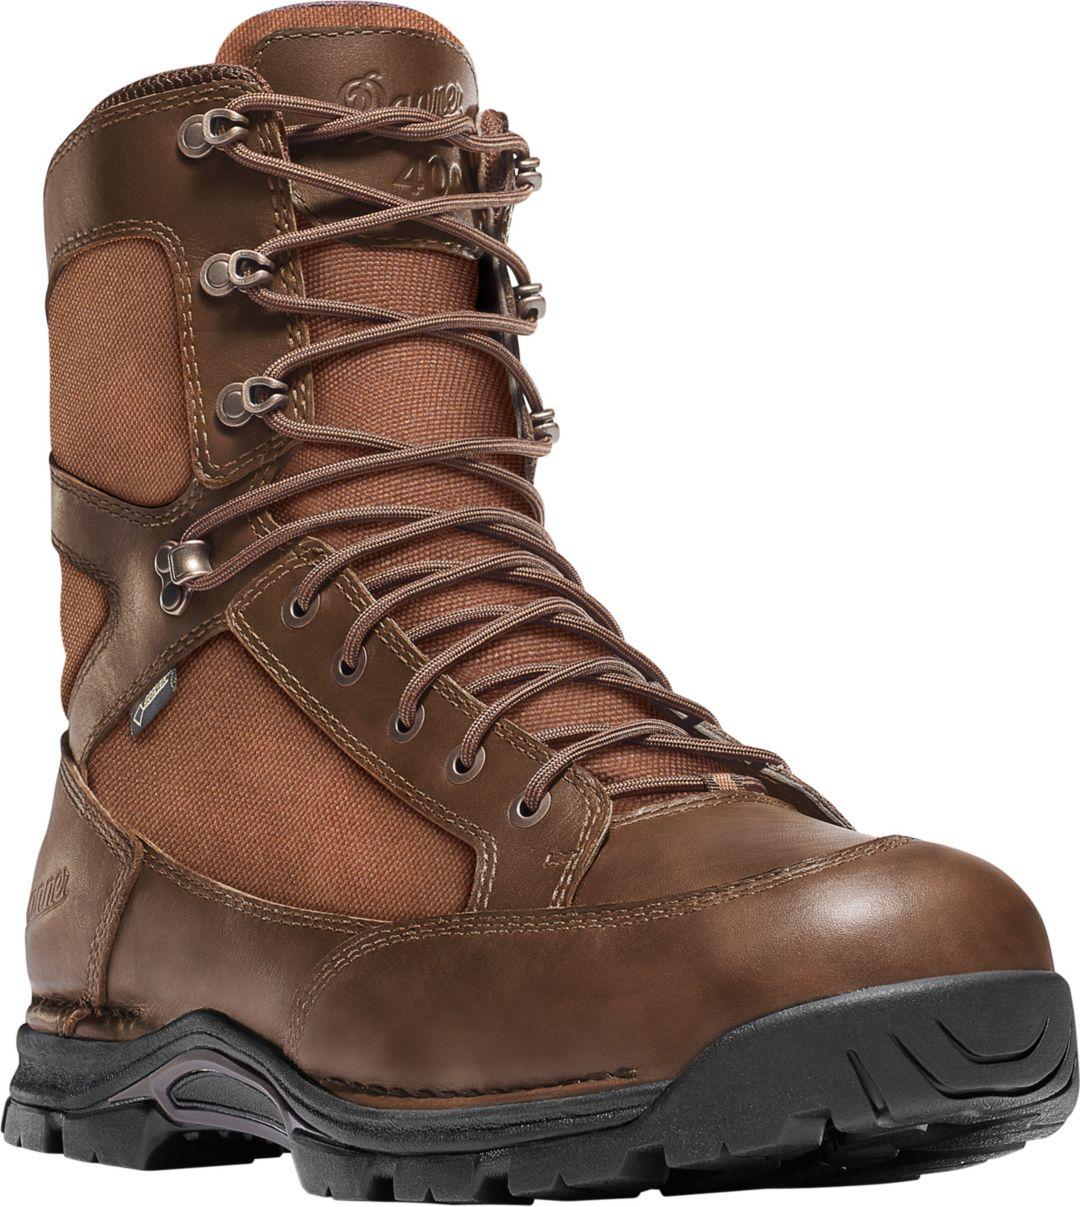 "e2b7c75b724 Danner Men's Pronghorn 8"" GORE-TEX Hunting Boots"